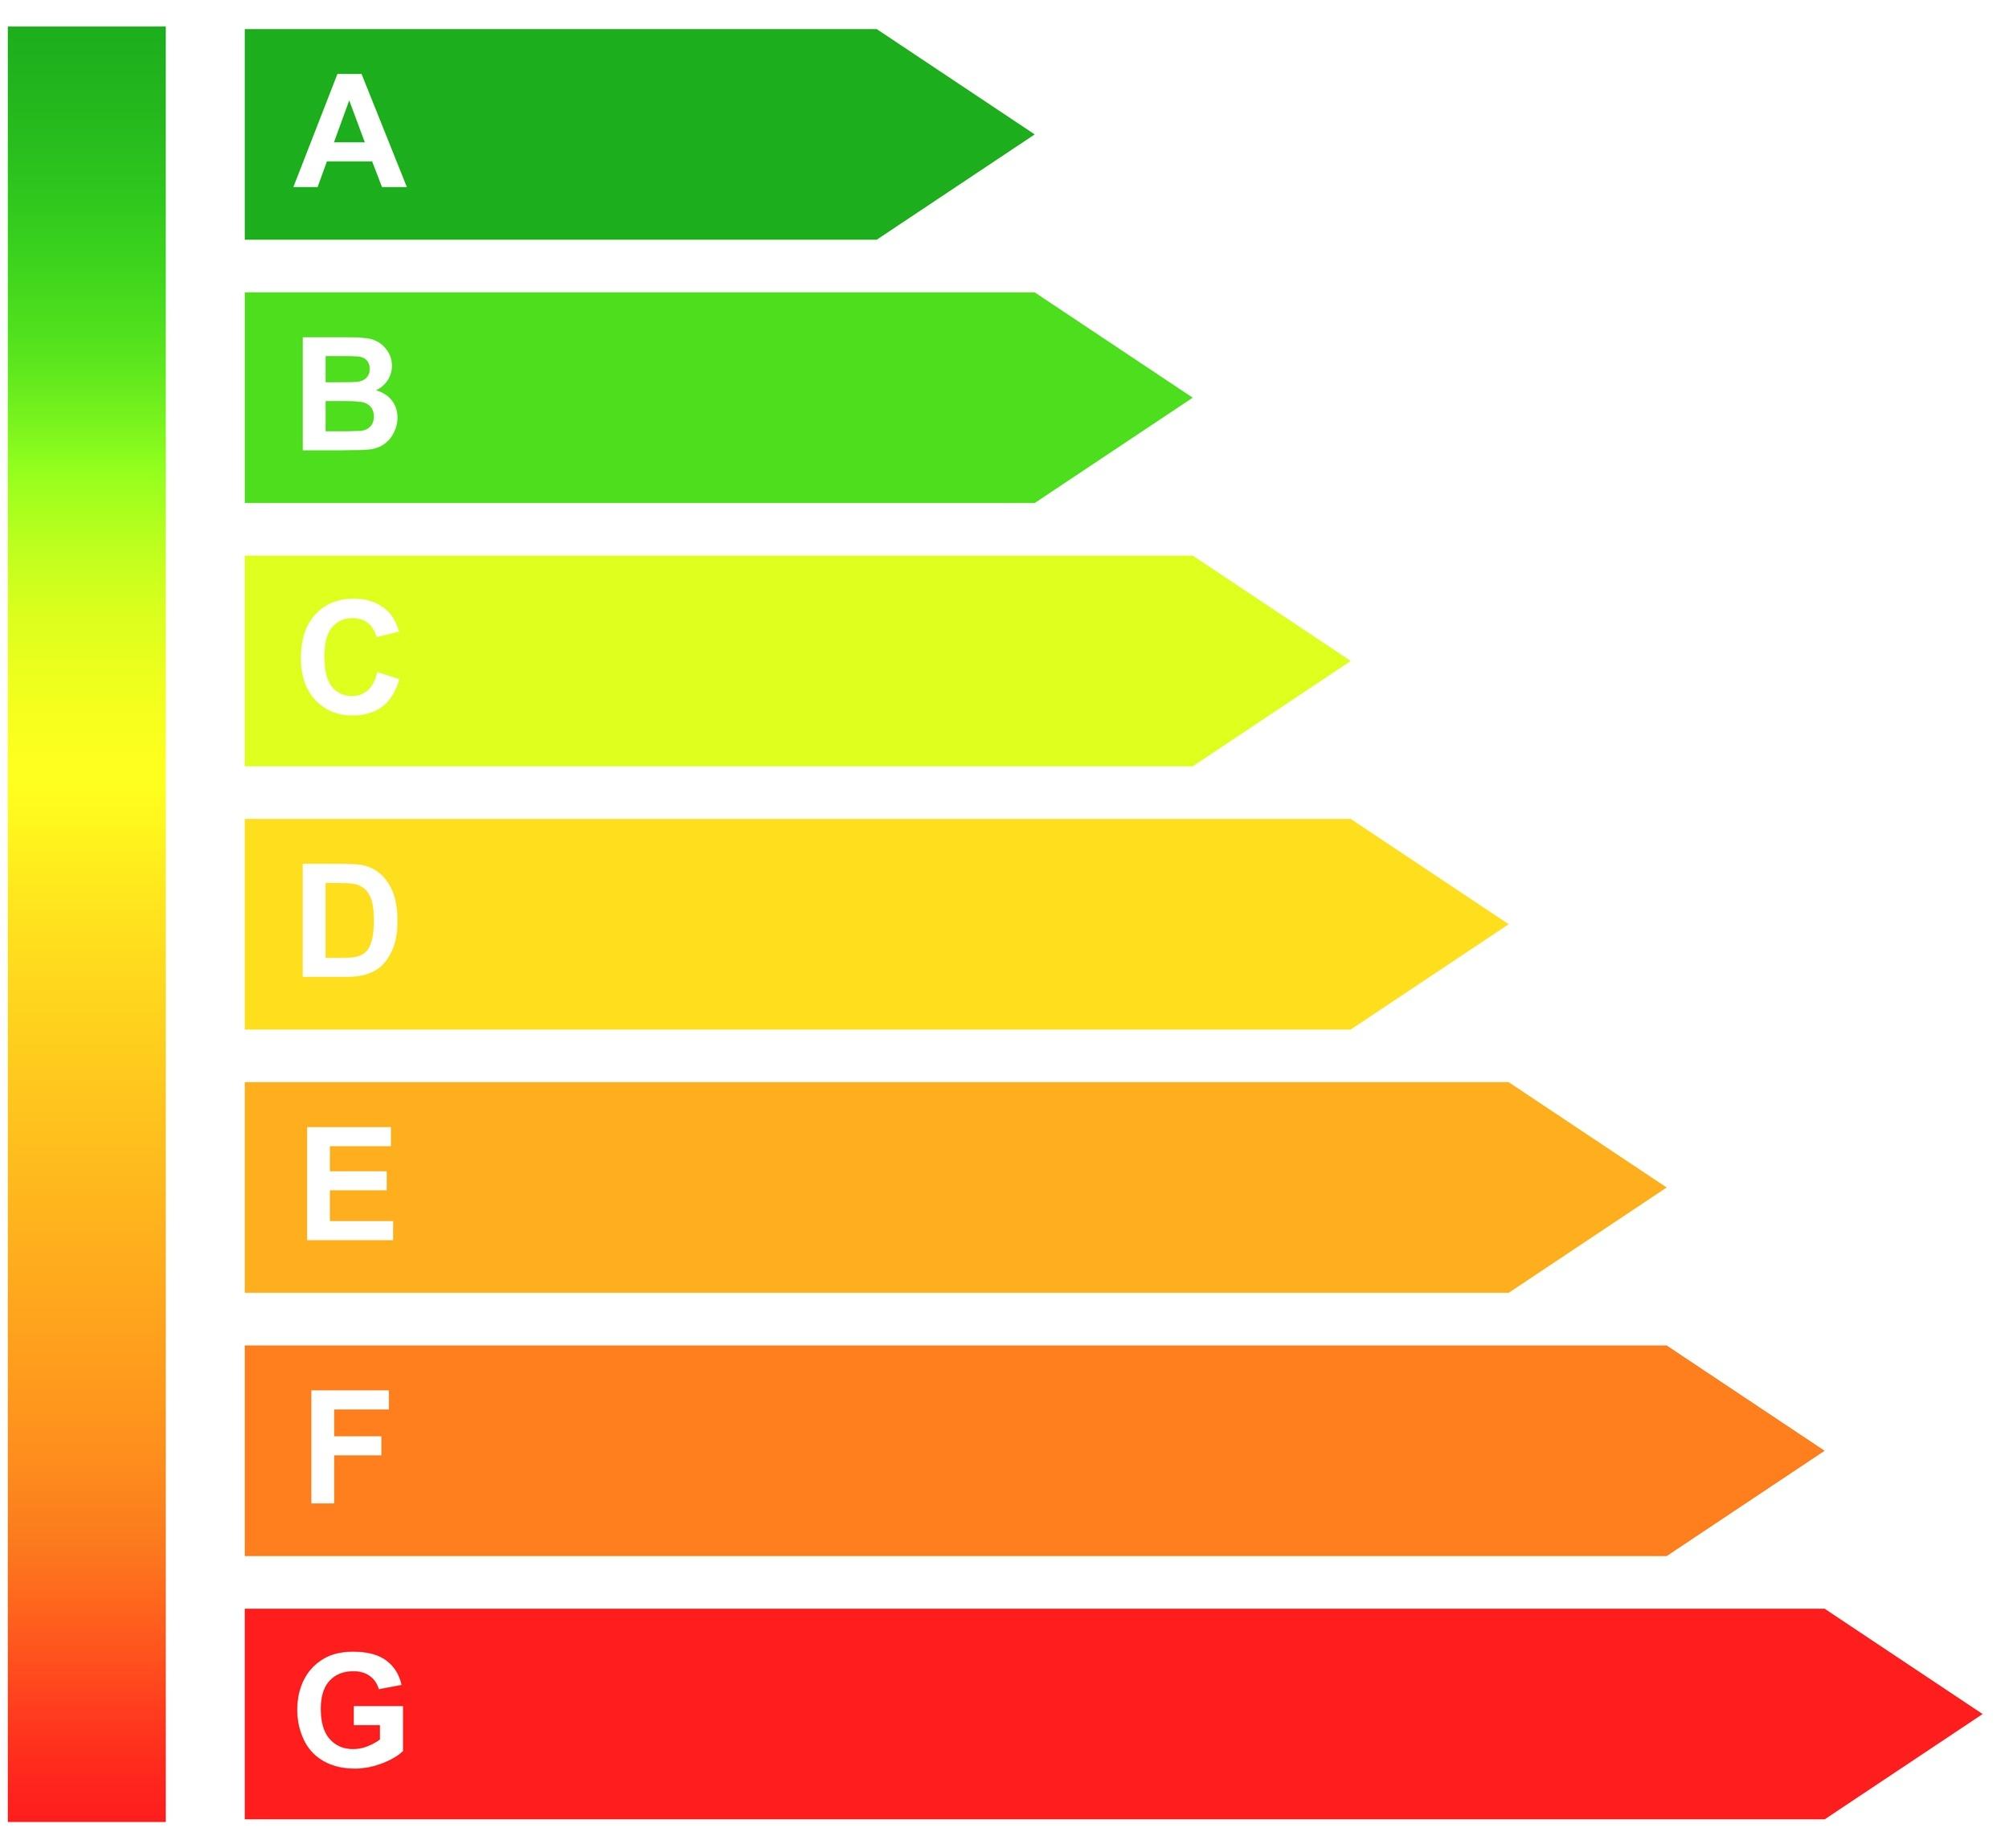 Classi Energetiche Edifici : Re agency immobiliari associate